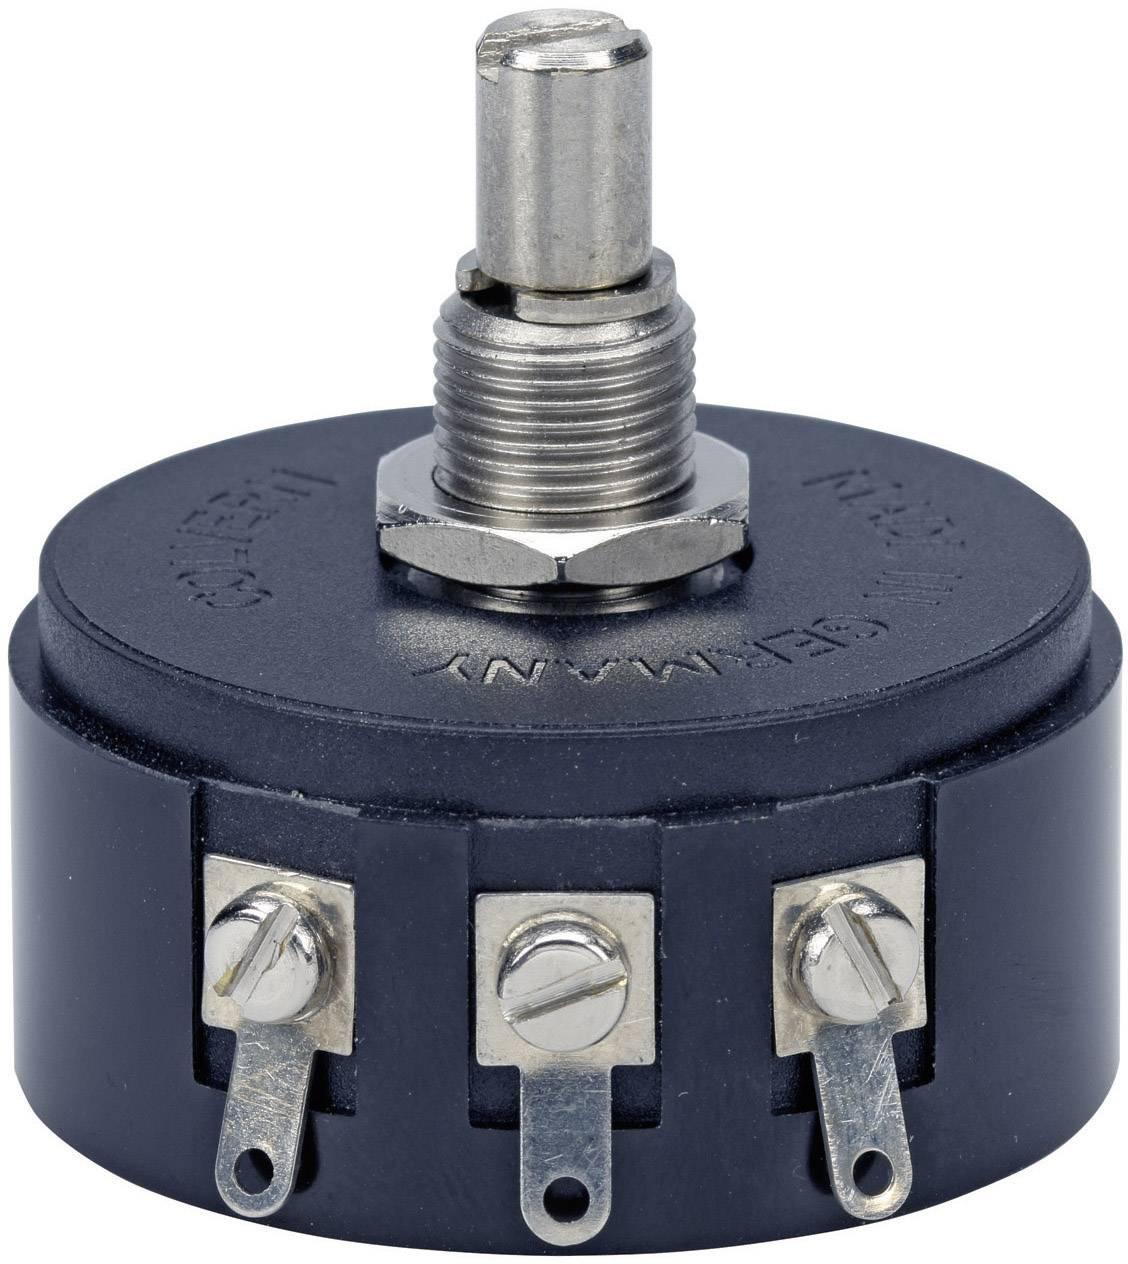 Drôtový potenciometer TT Electro, 3104001180, 25 kΩ, 3 W, ± 10%